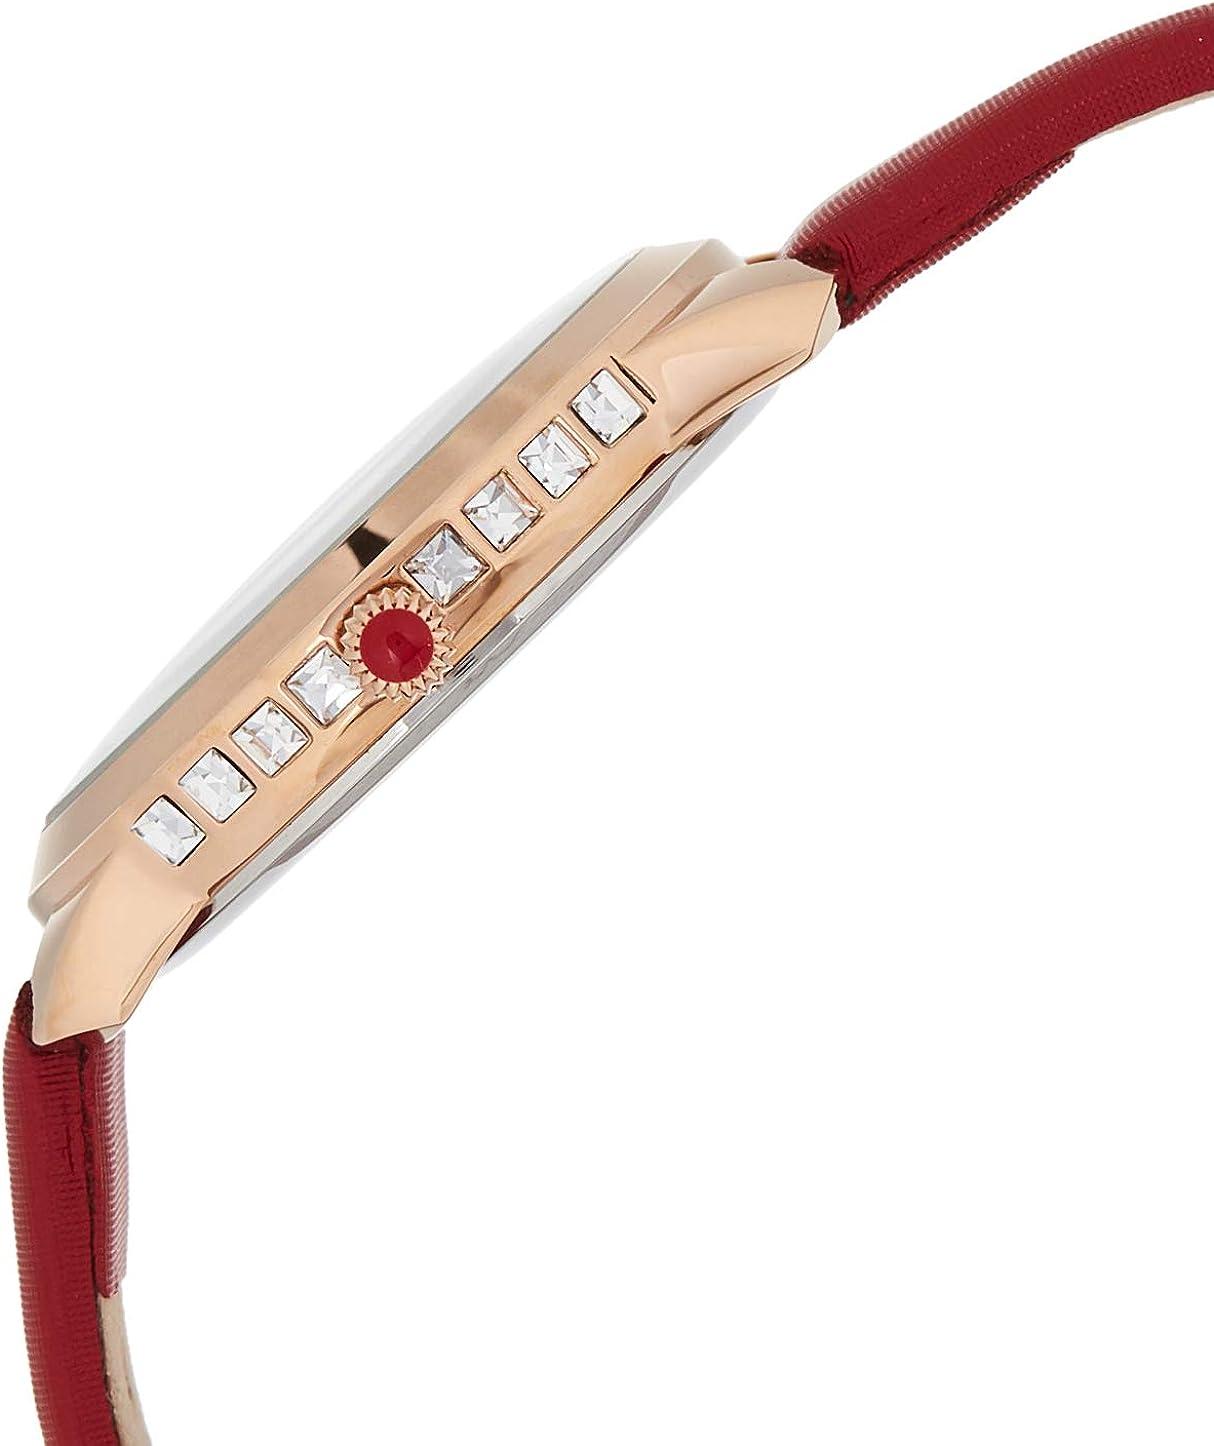 Akribos Swarovski Crystal Studded Watch – 3 Genuine Diamond Markers, Comfortable Leather Strap, Japanese Quartz - Elegant Women's Watch - AK1059 Red & Rose Gold